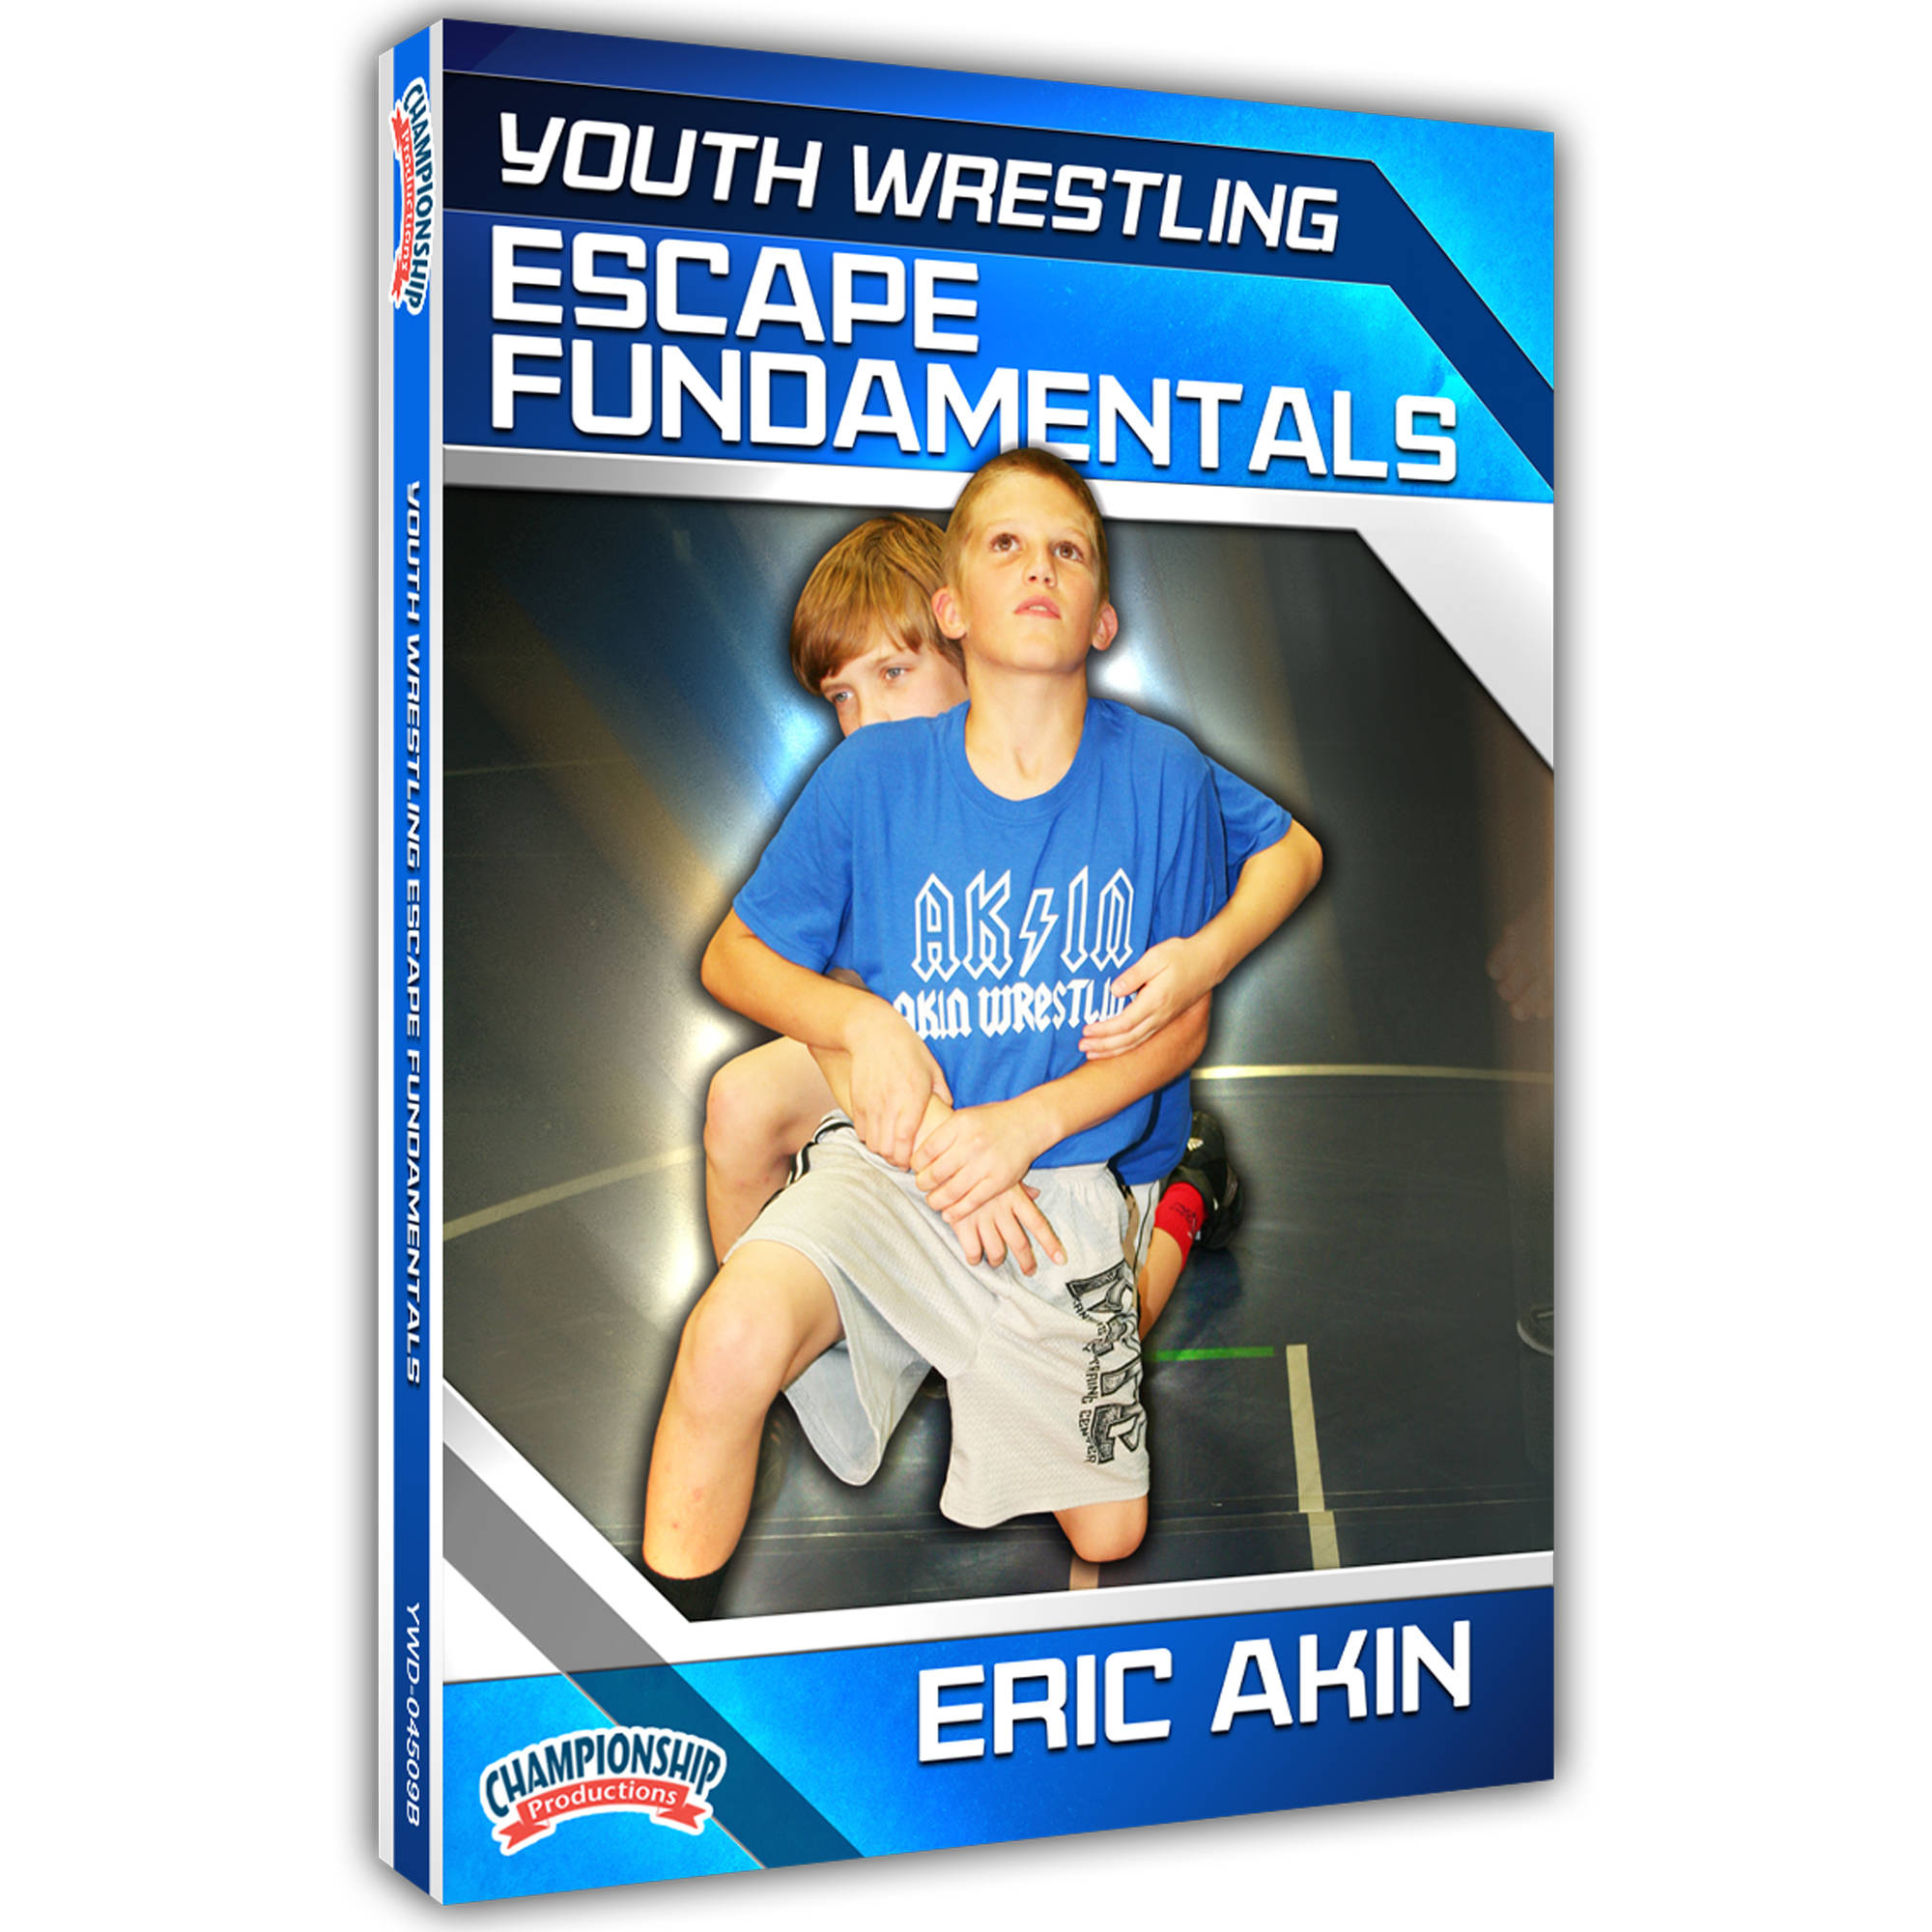 Youth Wrestling: Escape Fundamentals DVD